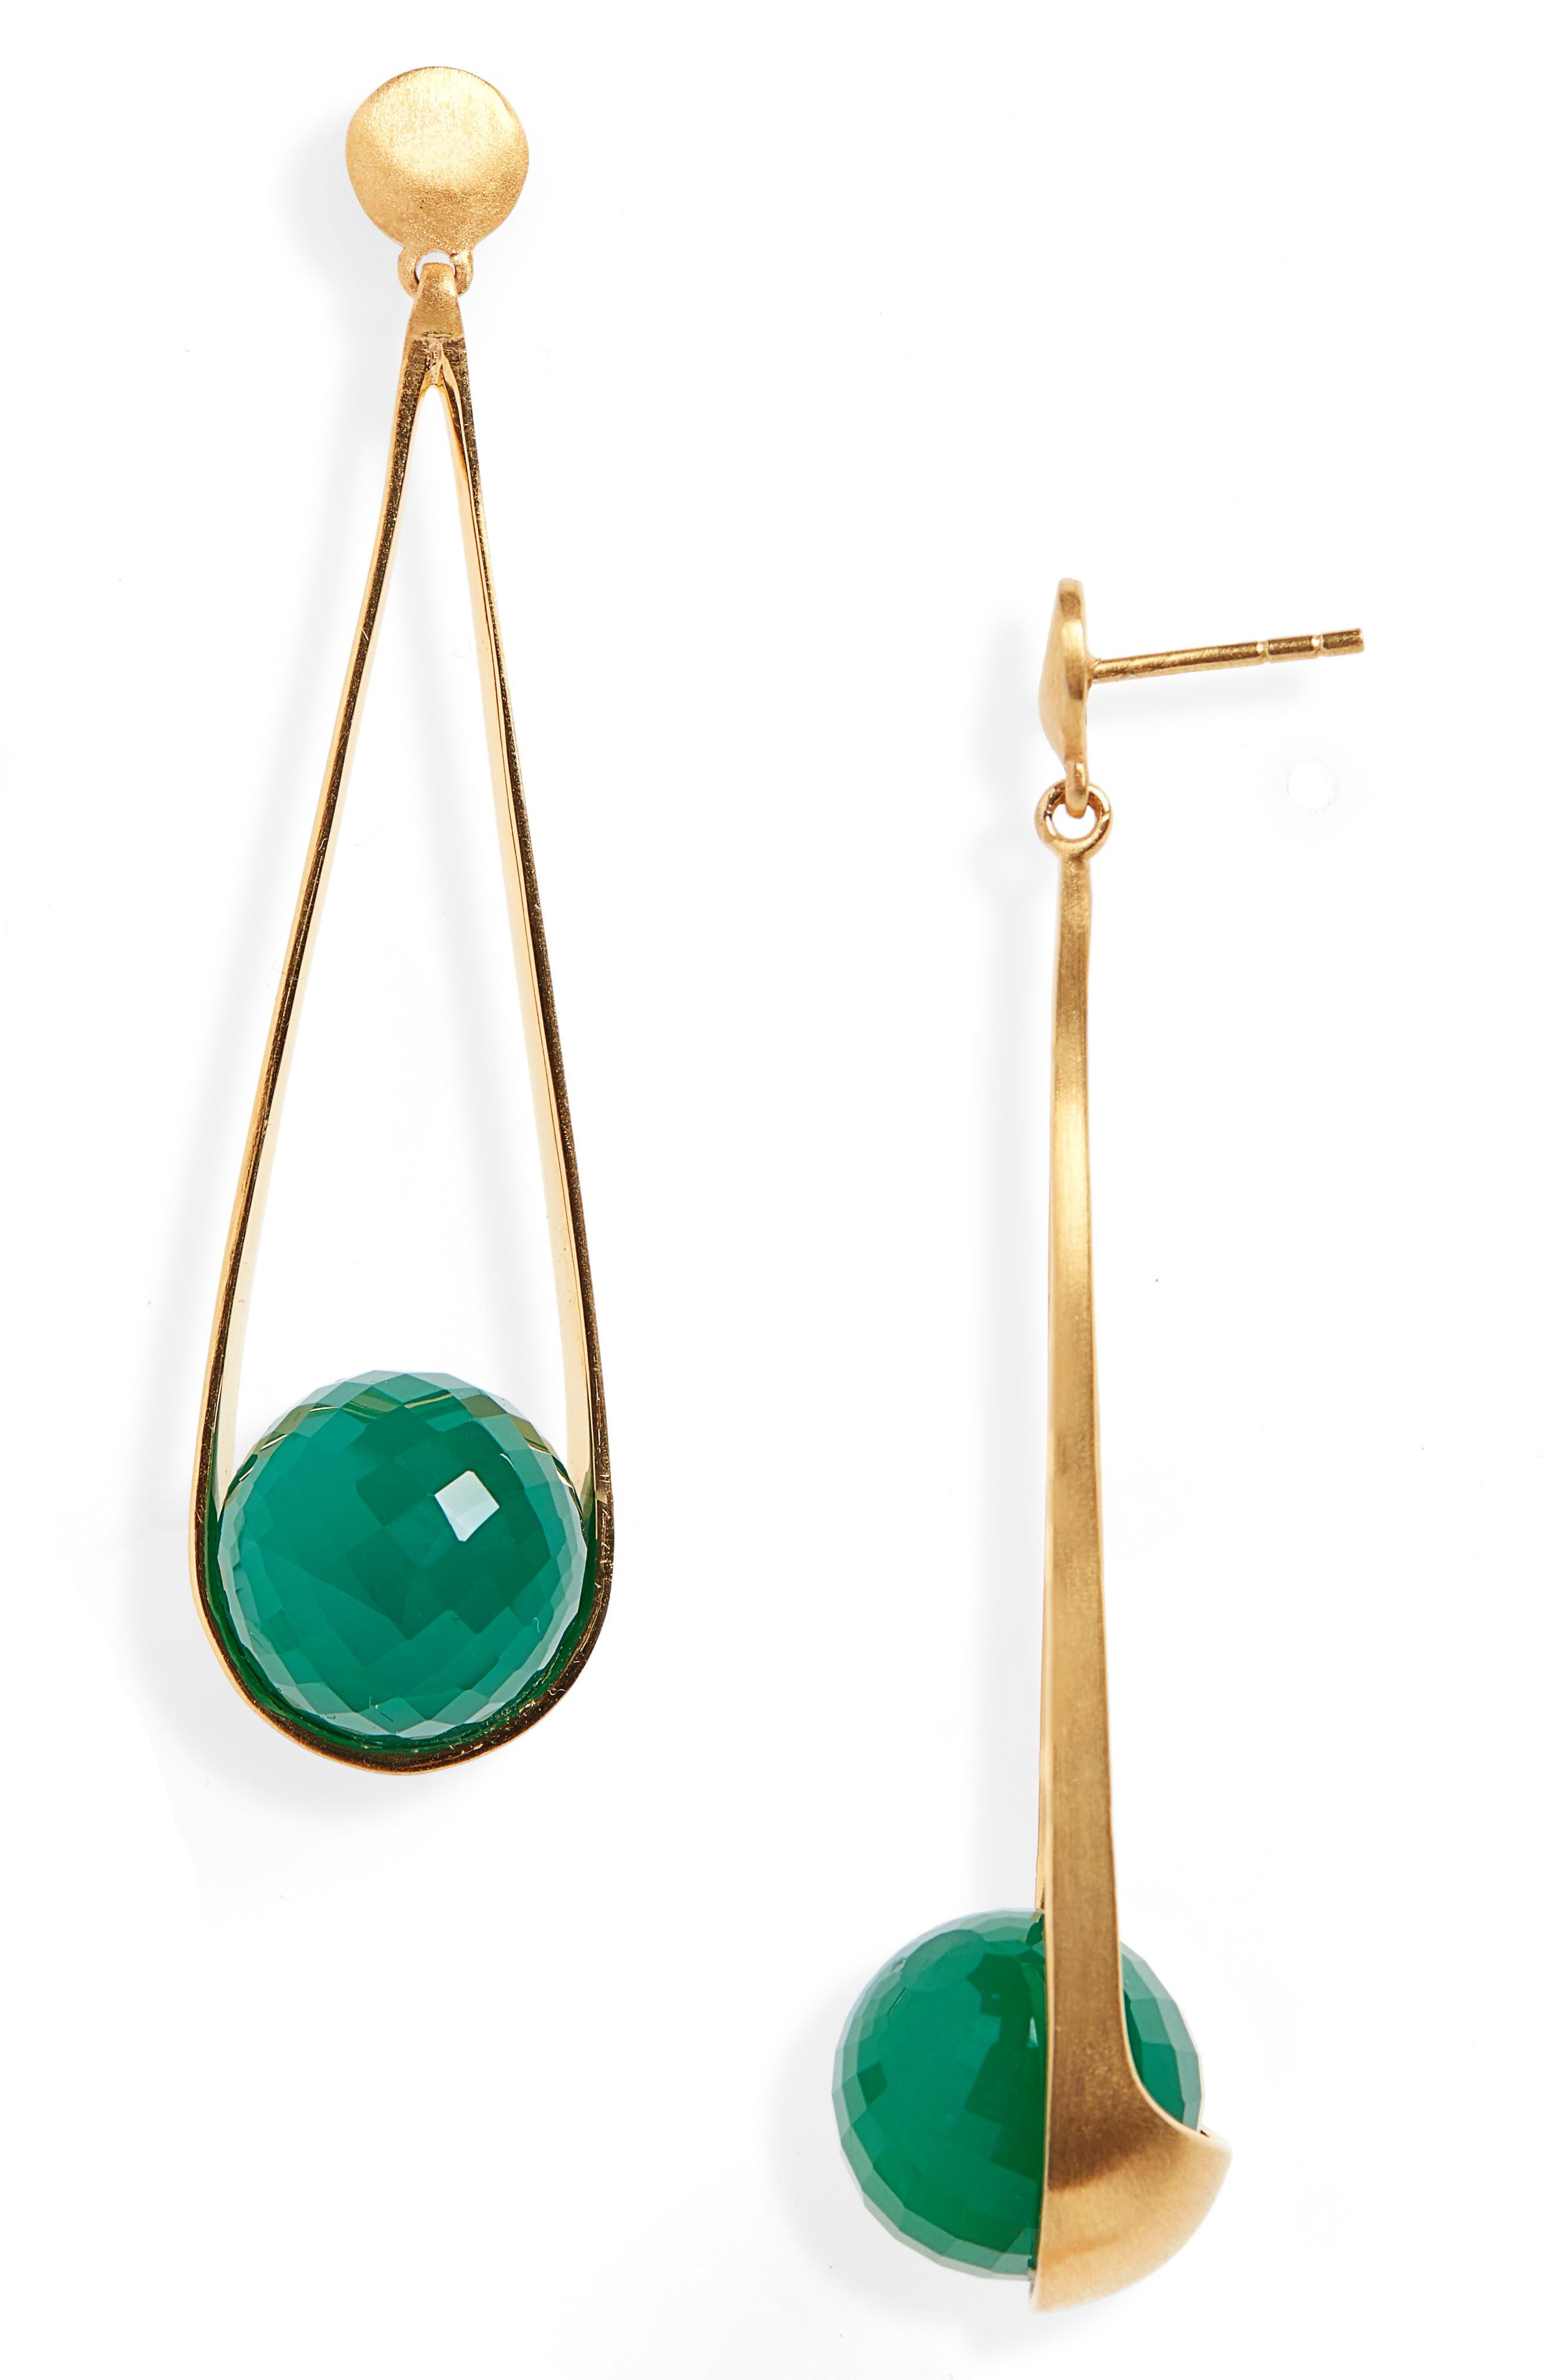 Ipanema Earrings,                             Main thumbnail 1, color,                             GREEN ONYX/ GOLD